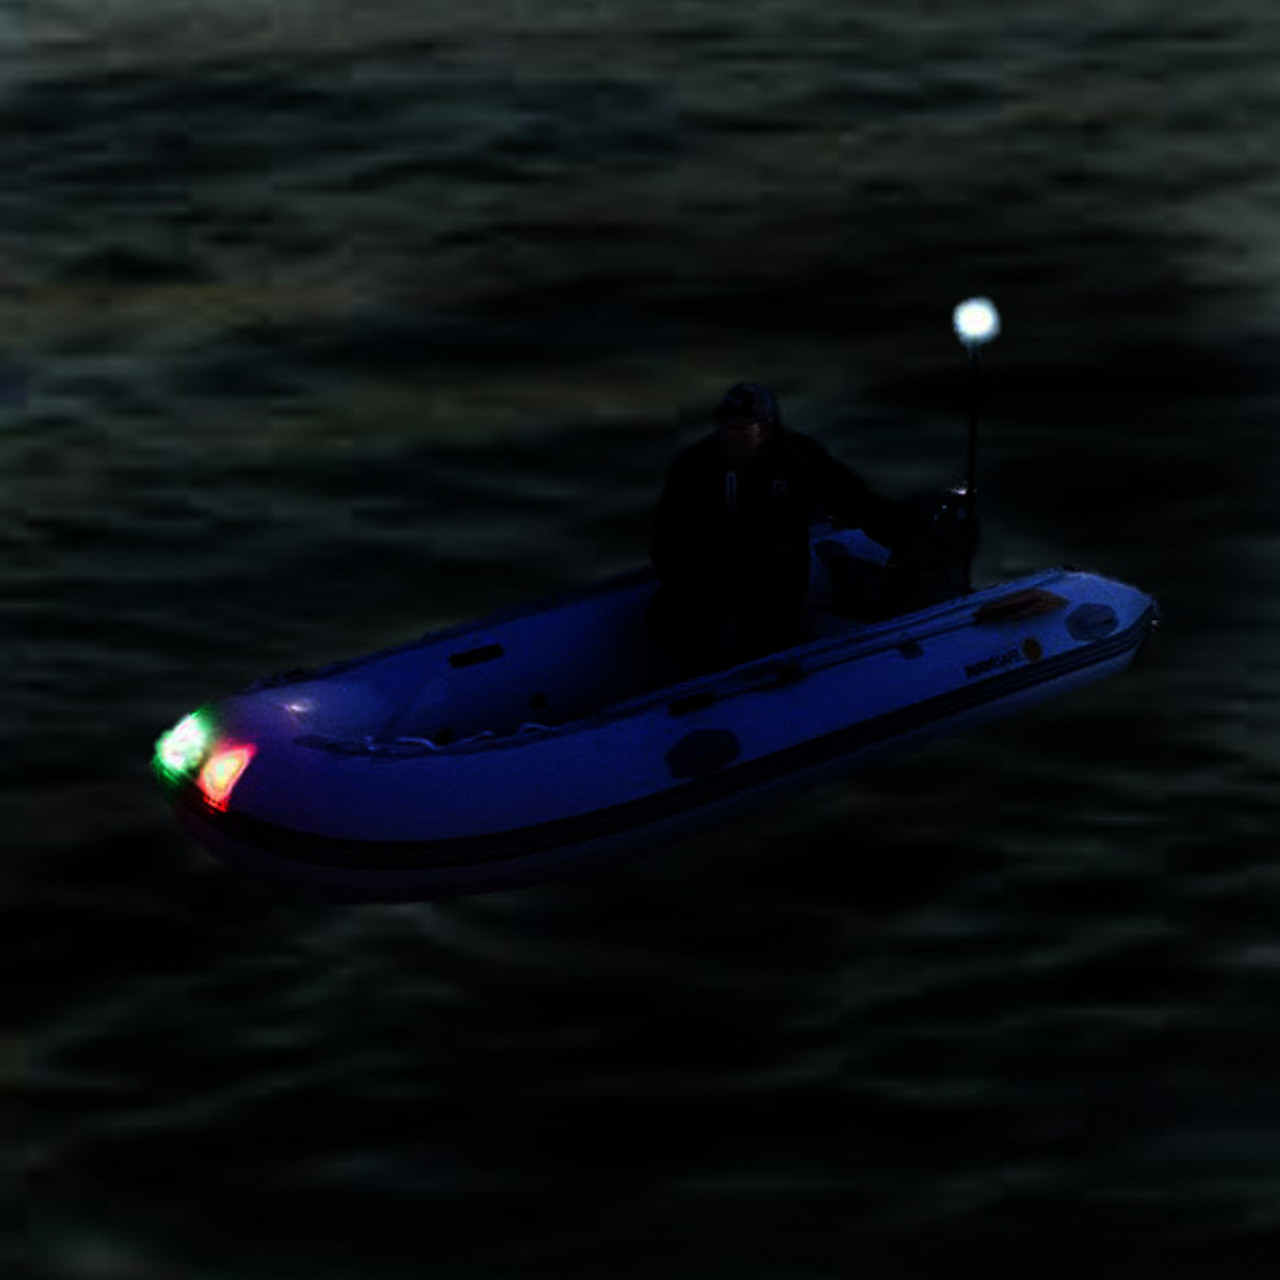 LED Navigation Light Kit for Dinghy